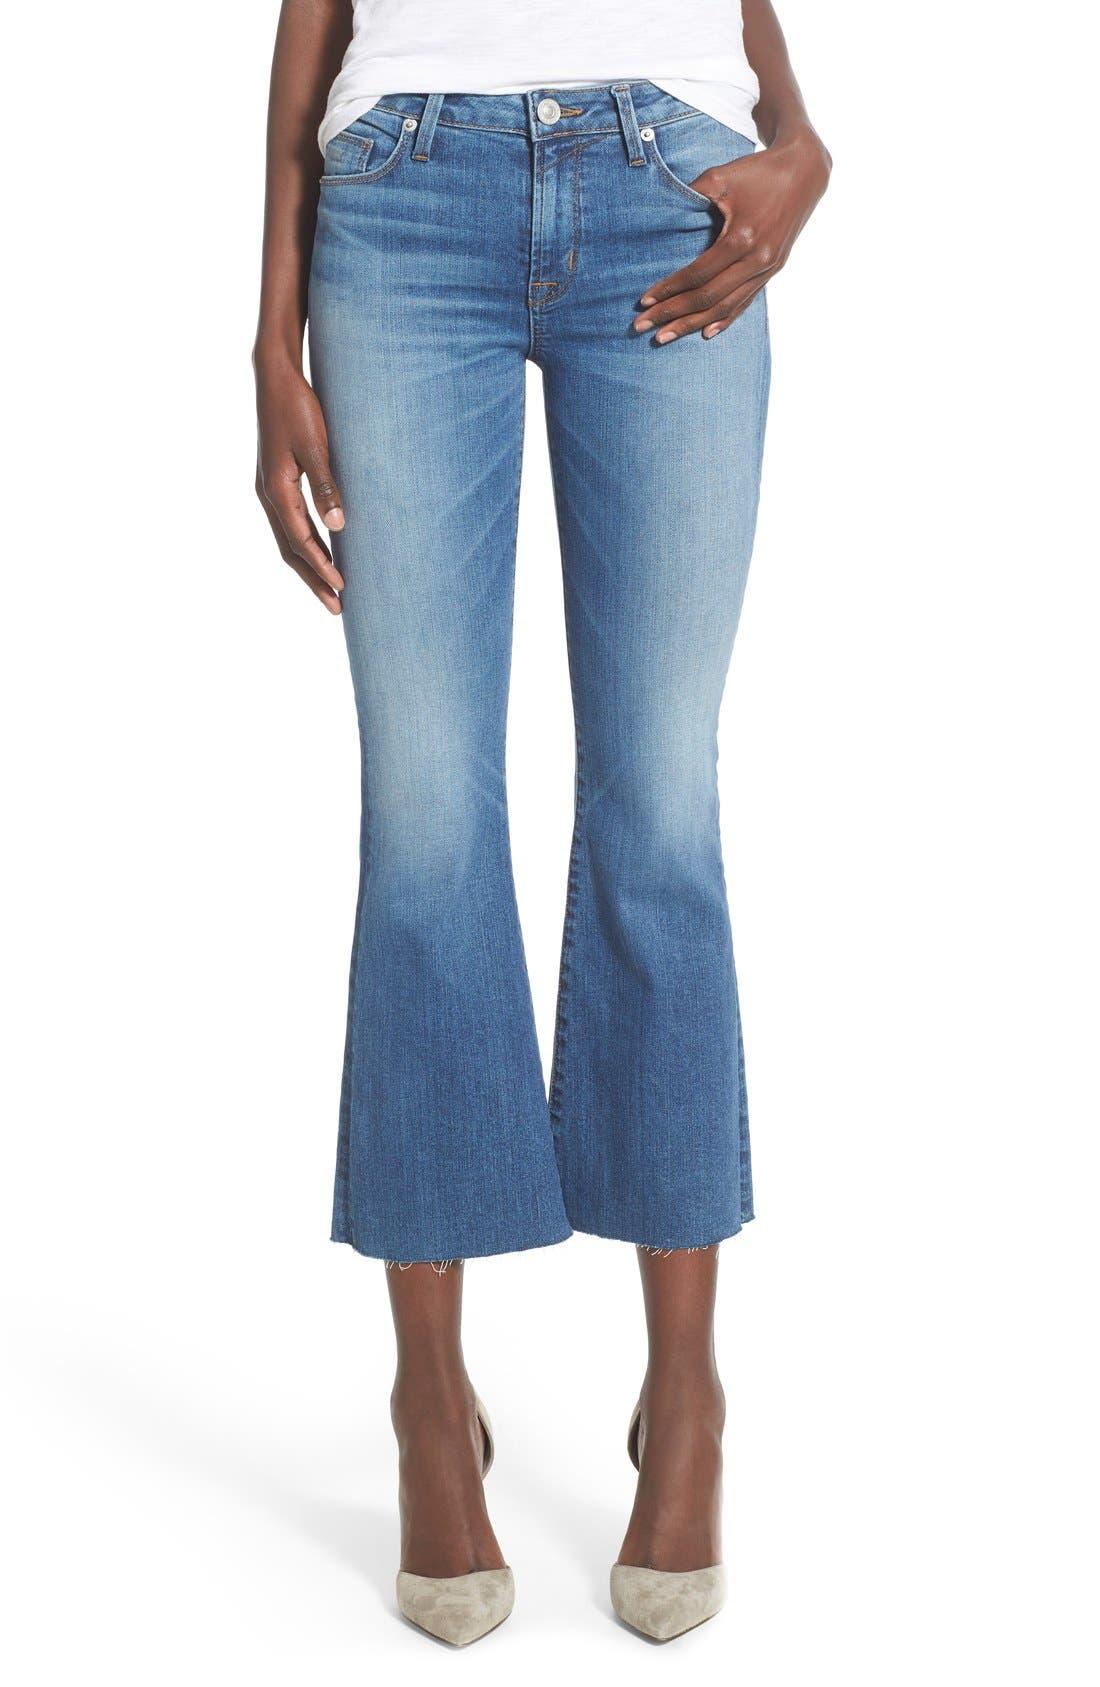 Main Image - Hudson Jeans 'Mia' Raw Hem Crop Flare Jeans (Carve)